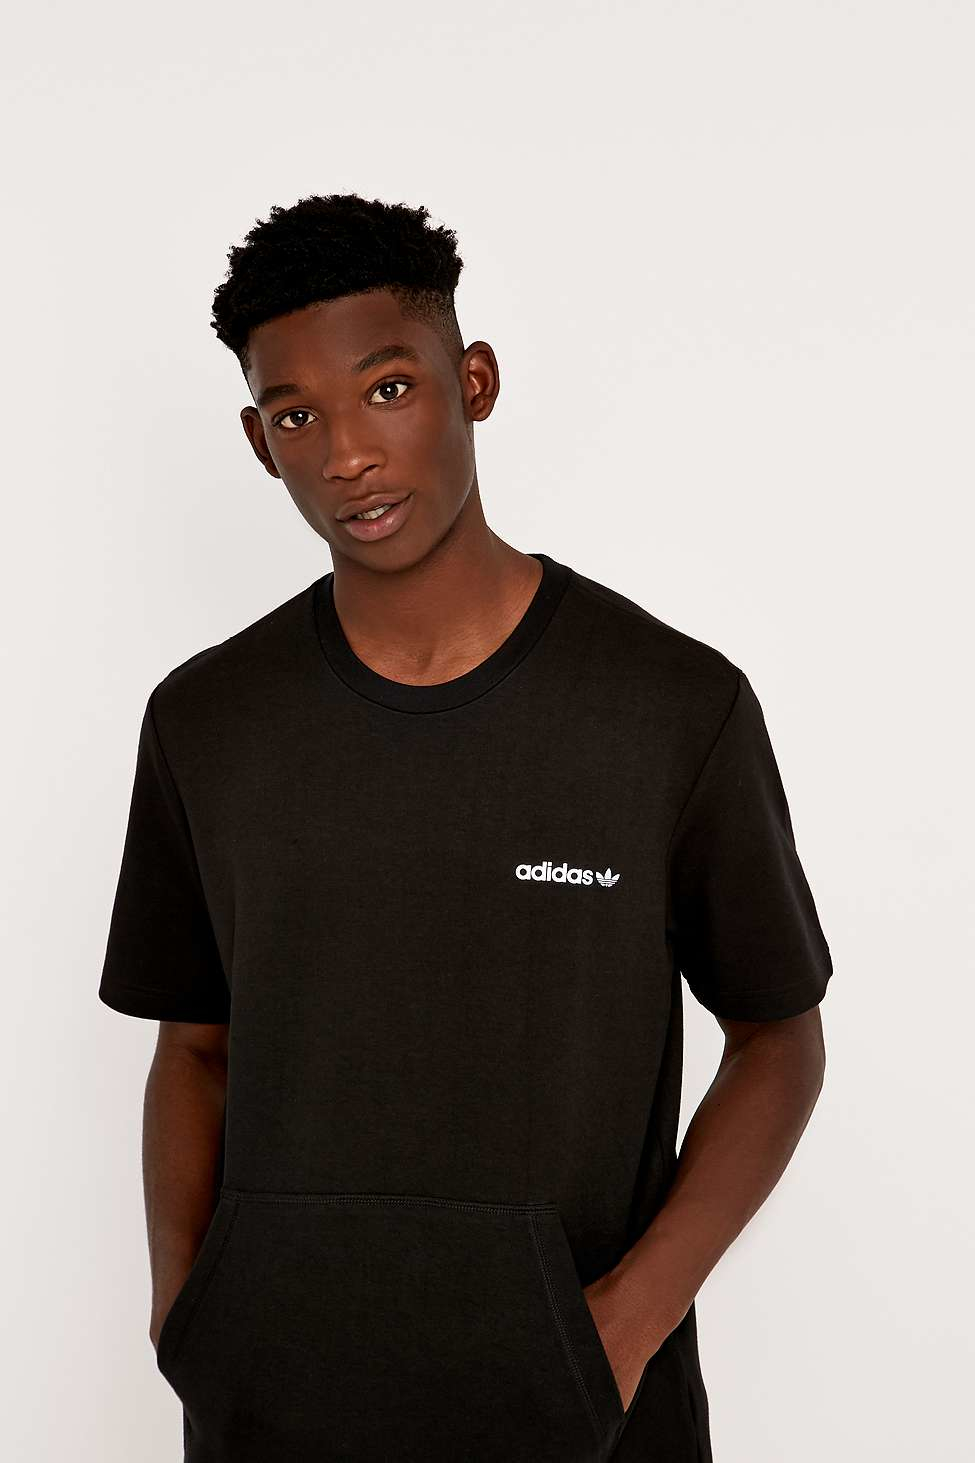 nike air max 2012 hommes - Adidas Modern Black Tee in Black for Men | Lyst